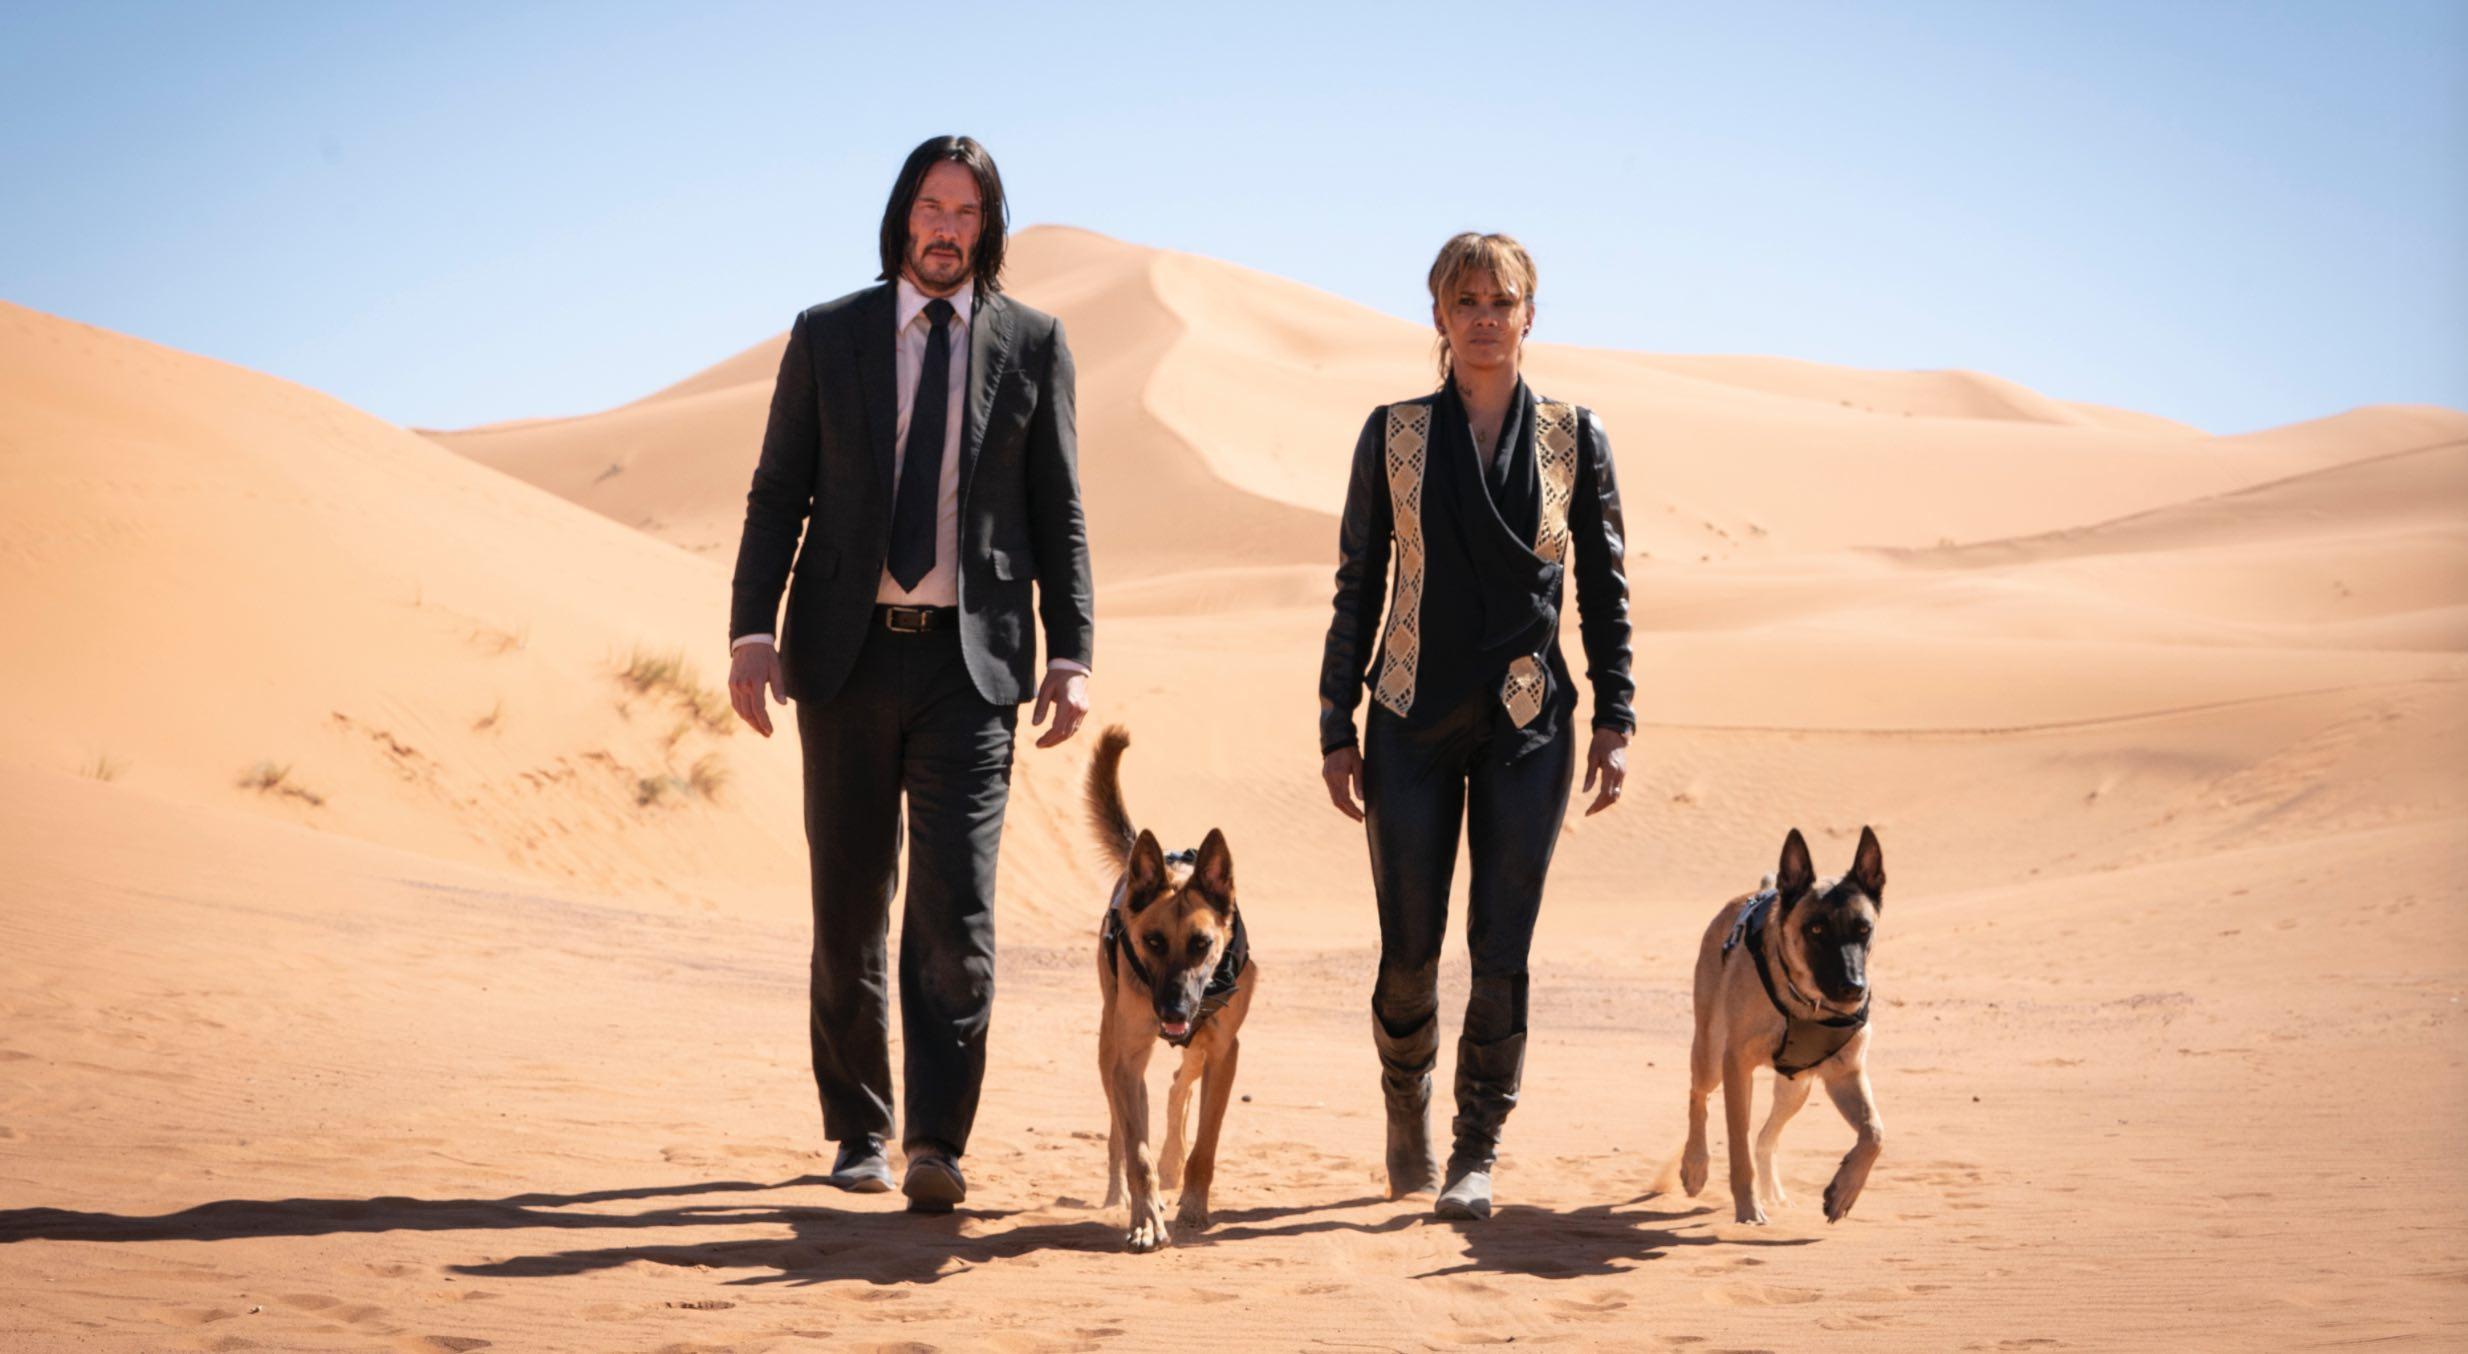 John Wick Keanu Reeves Halle Berry dogs